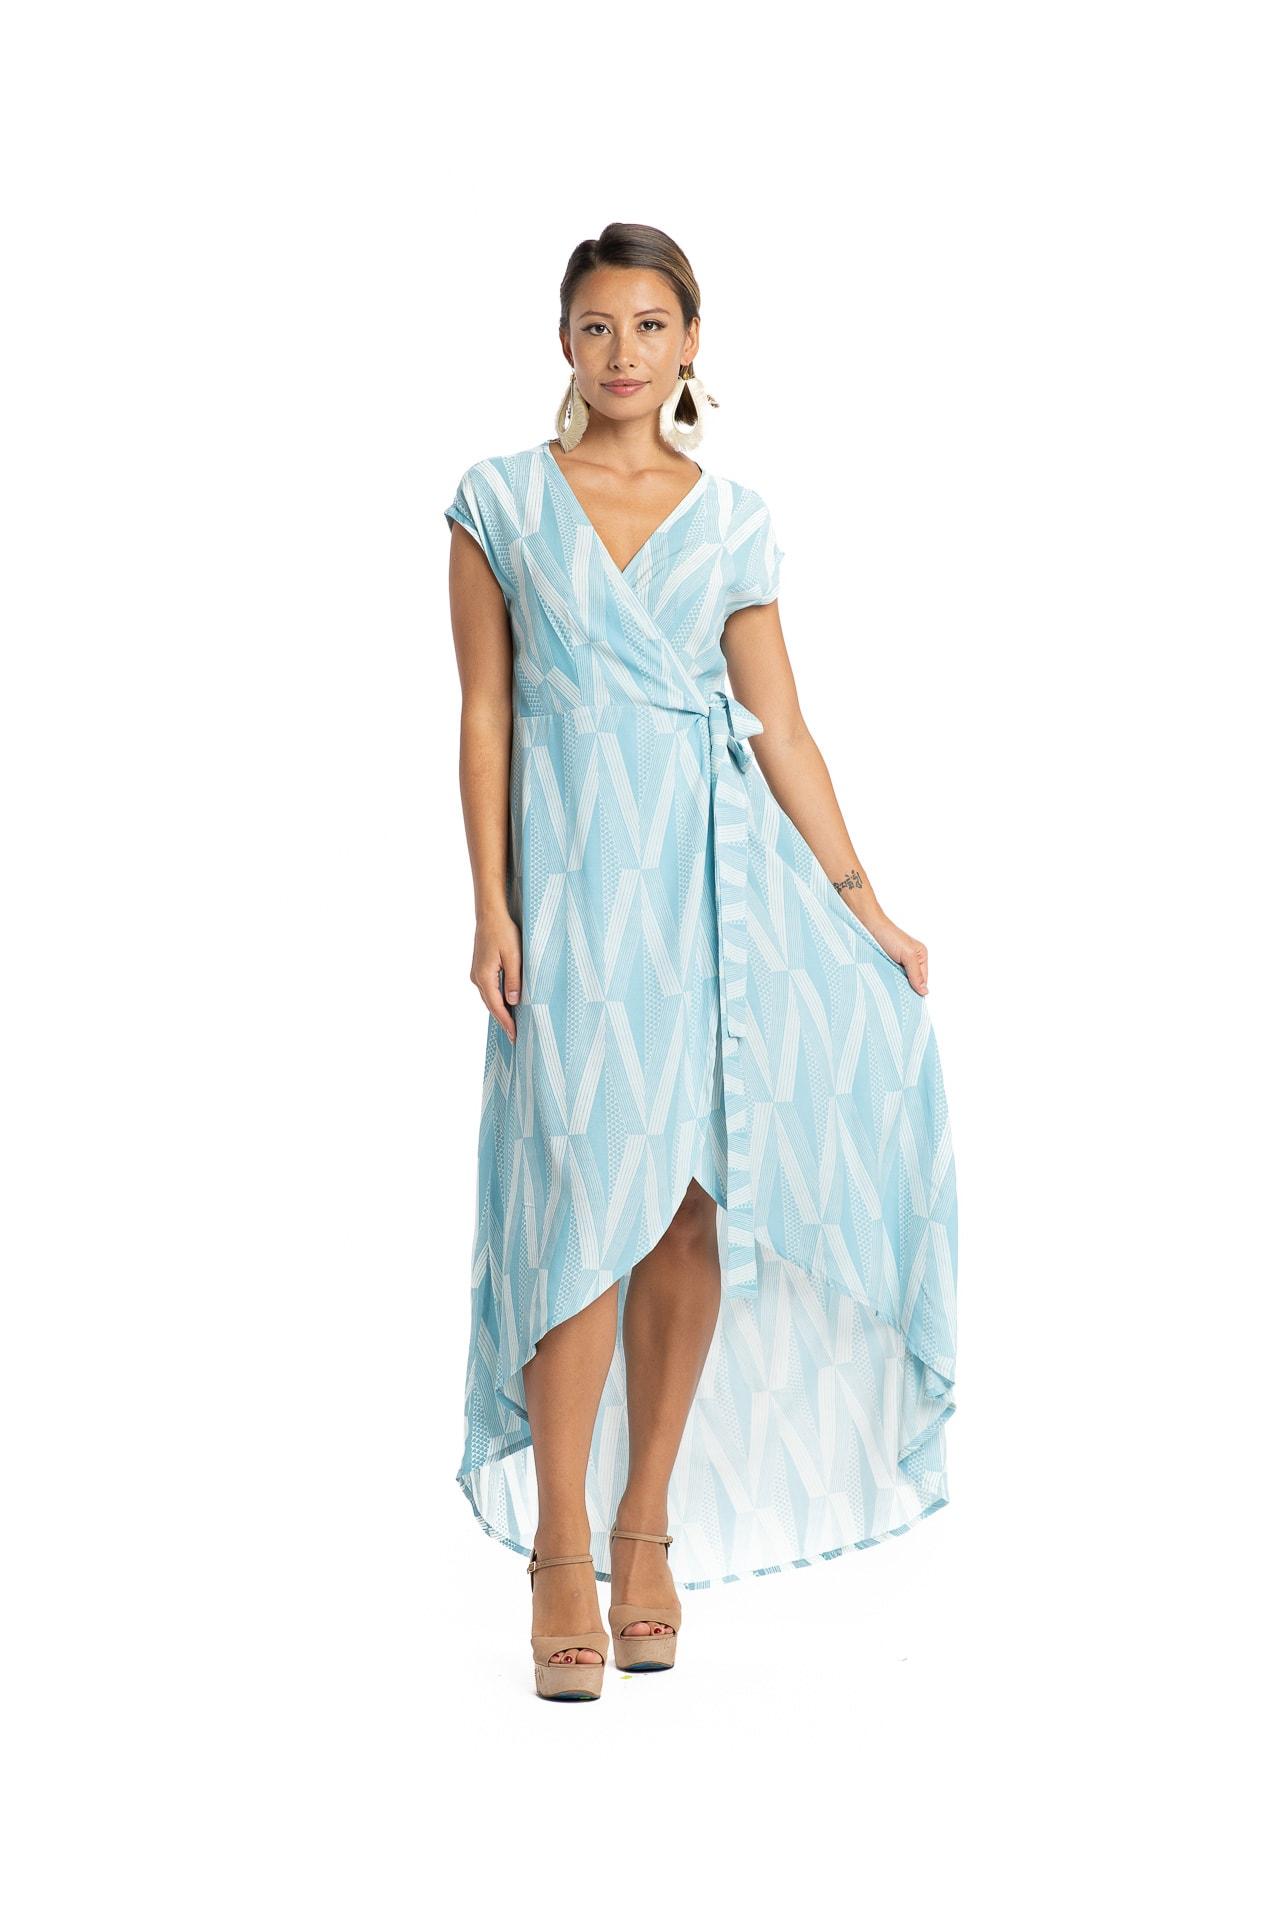 Model wearing Panana Wrap Dress